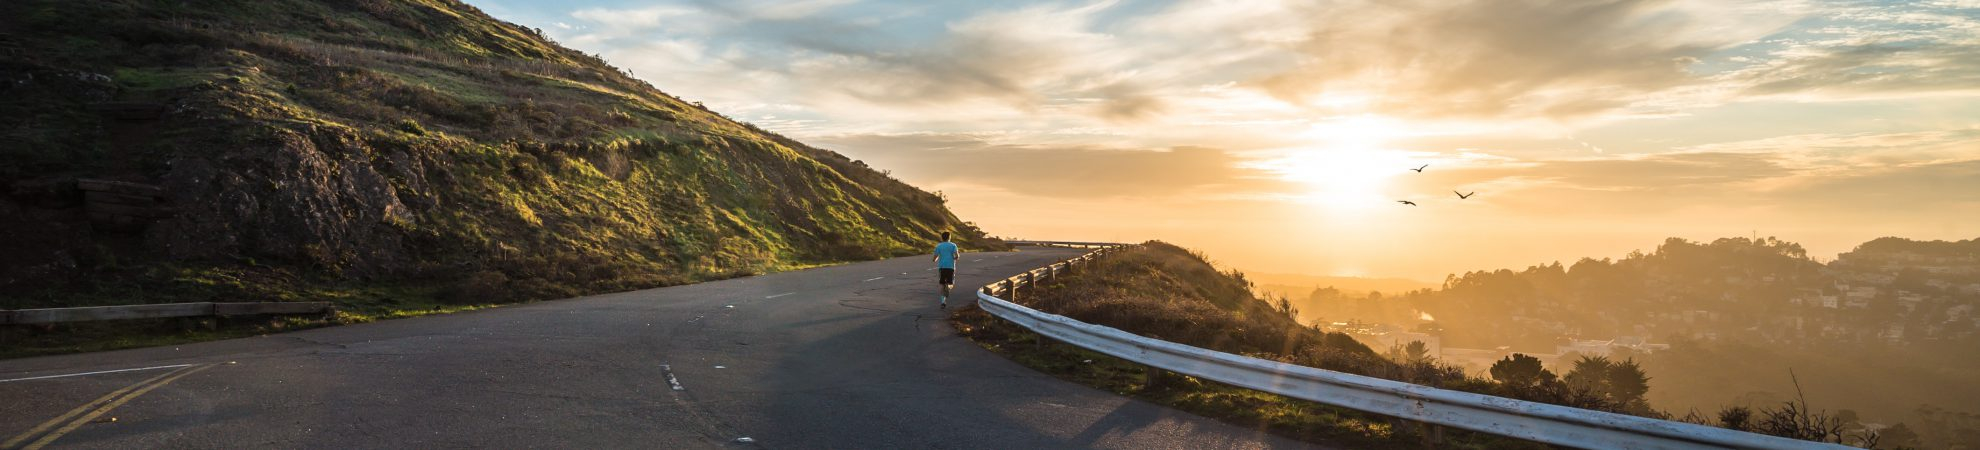 Triathlon: 12 Simple Ways to get Faster Next Season